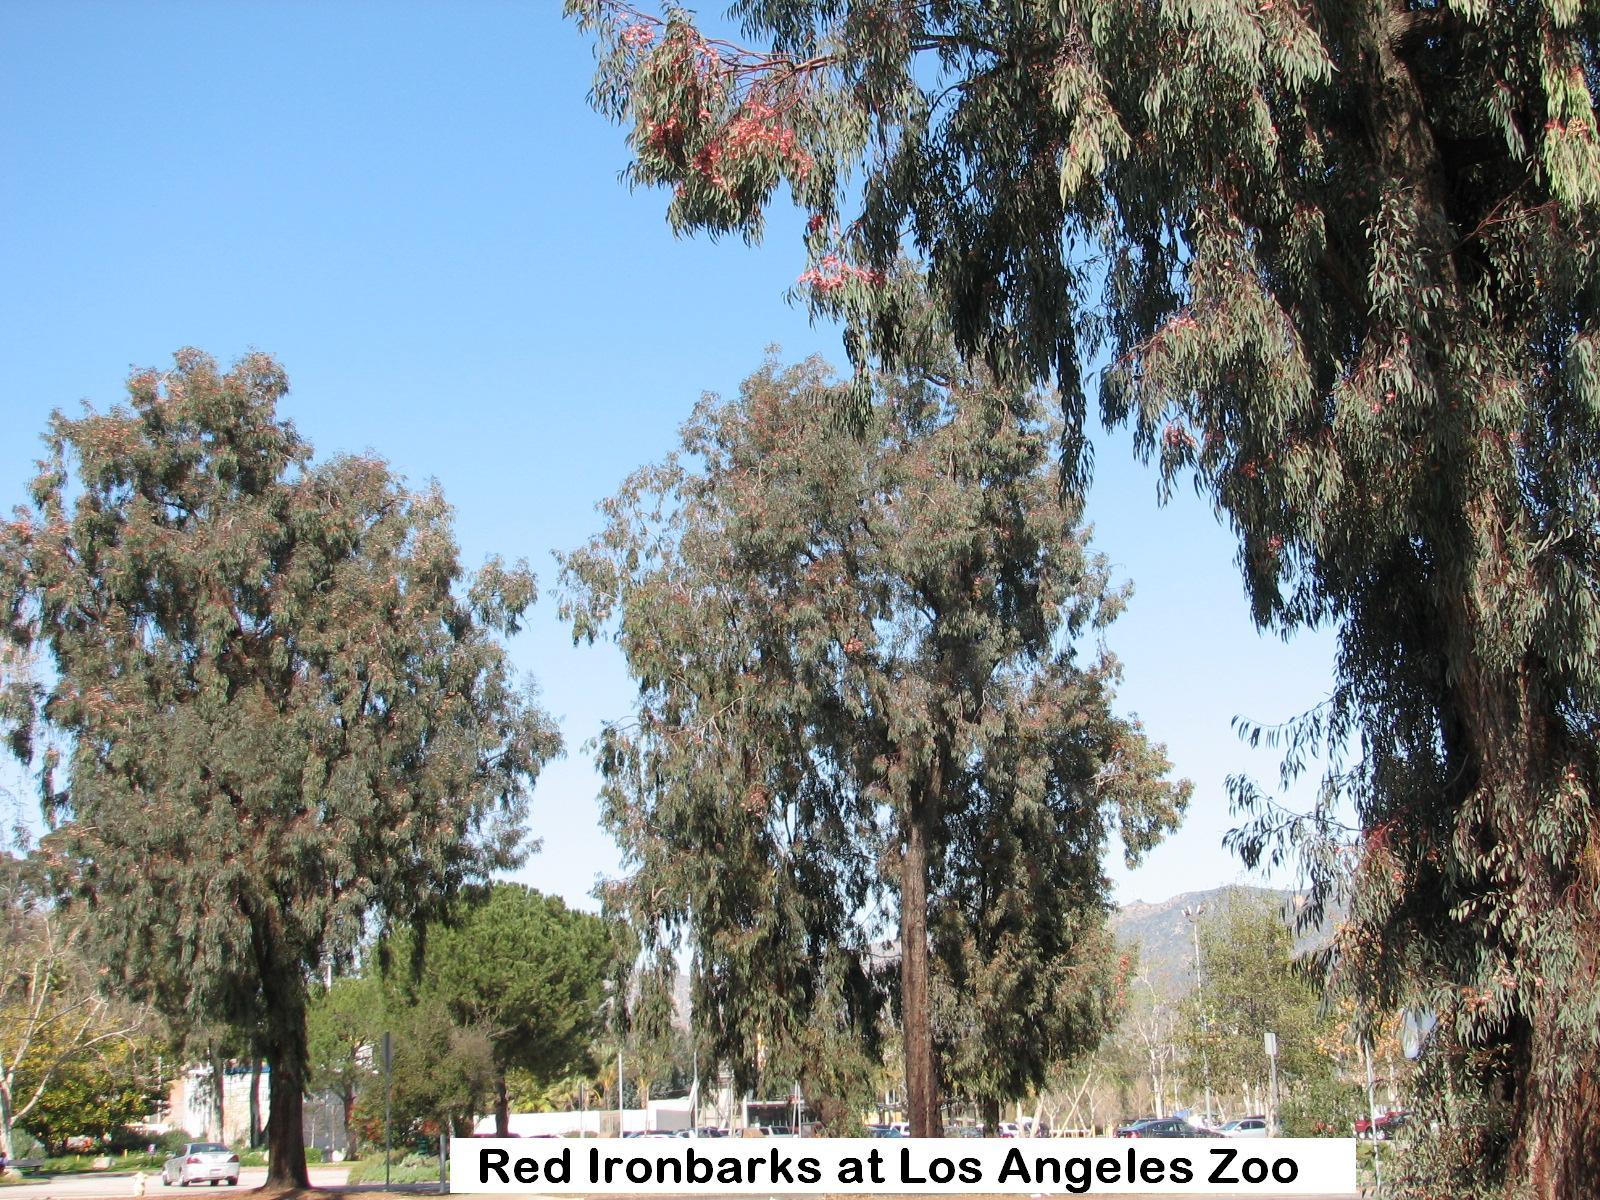 t3 Los Angeles Zoo IRONBARKS.jpg